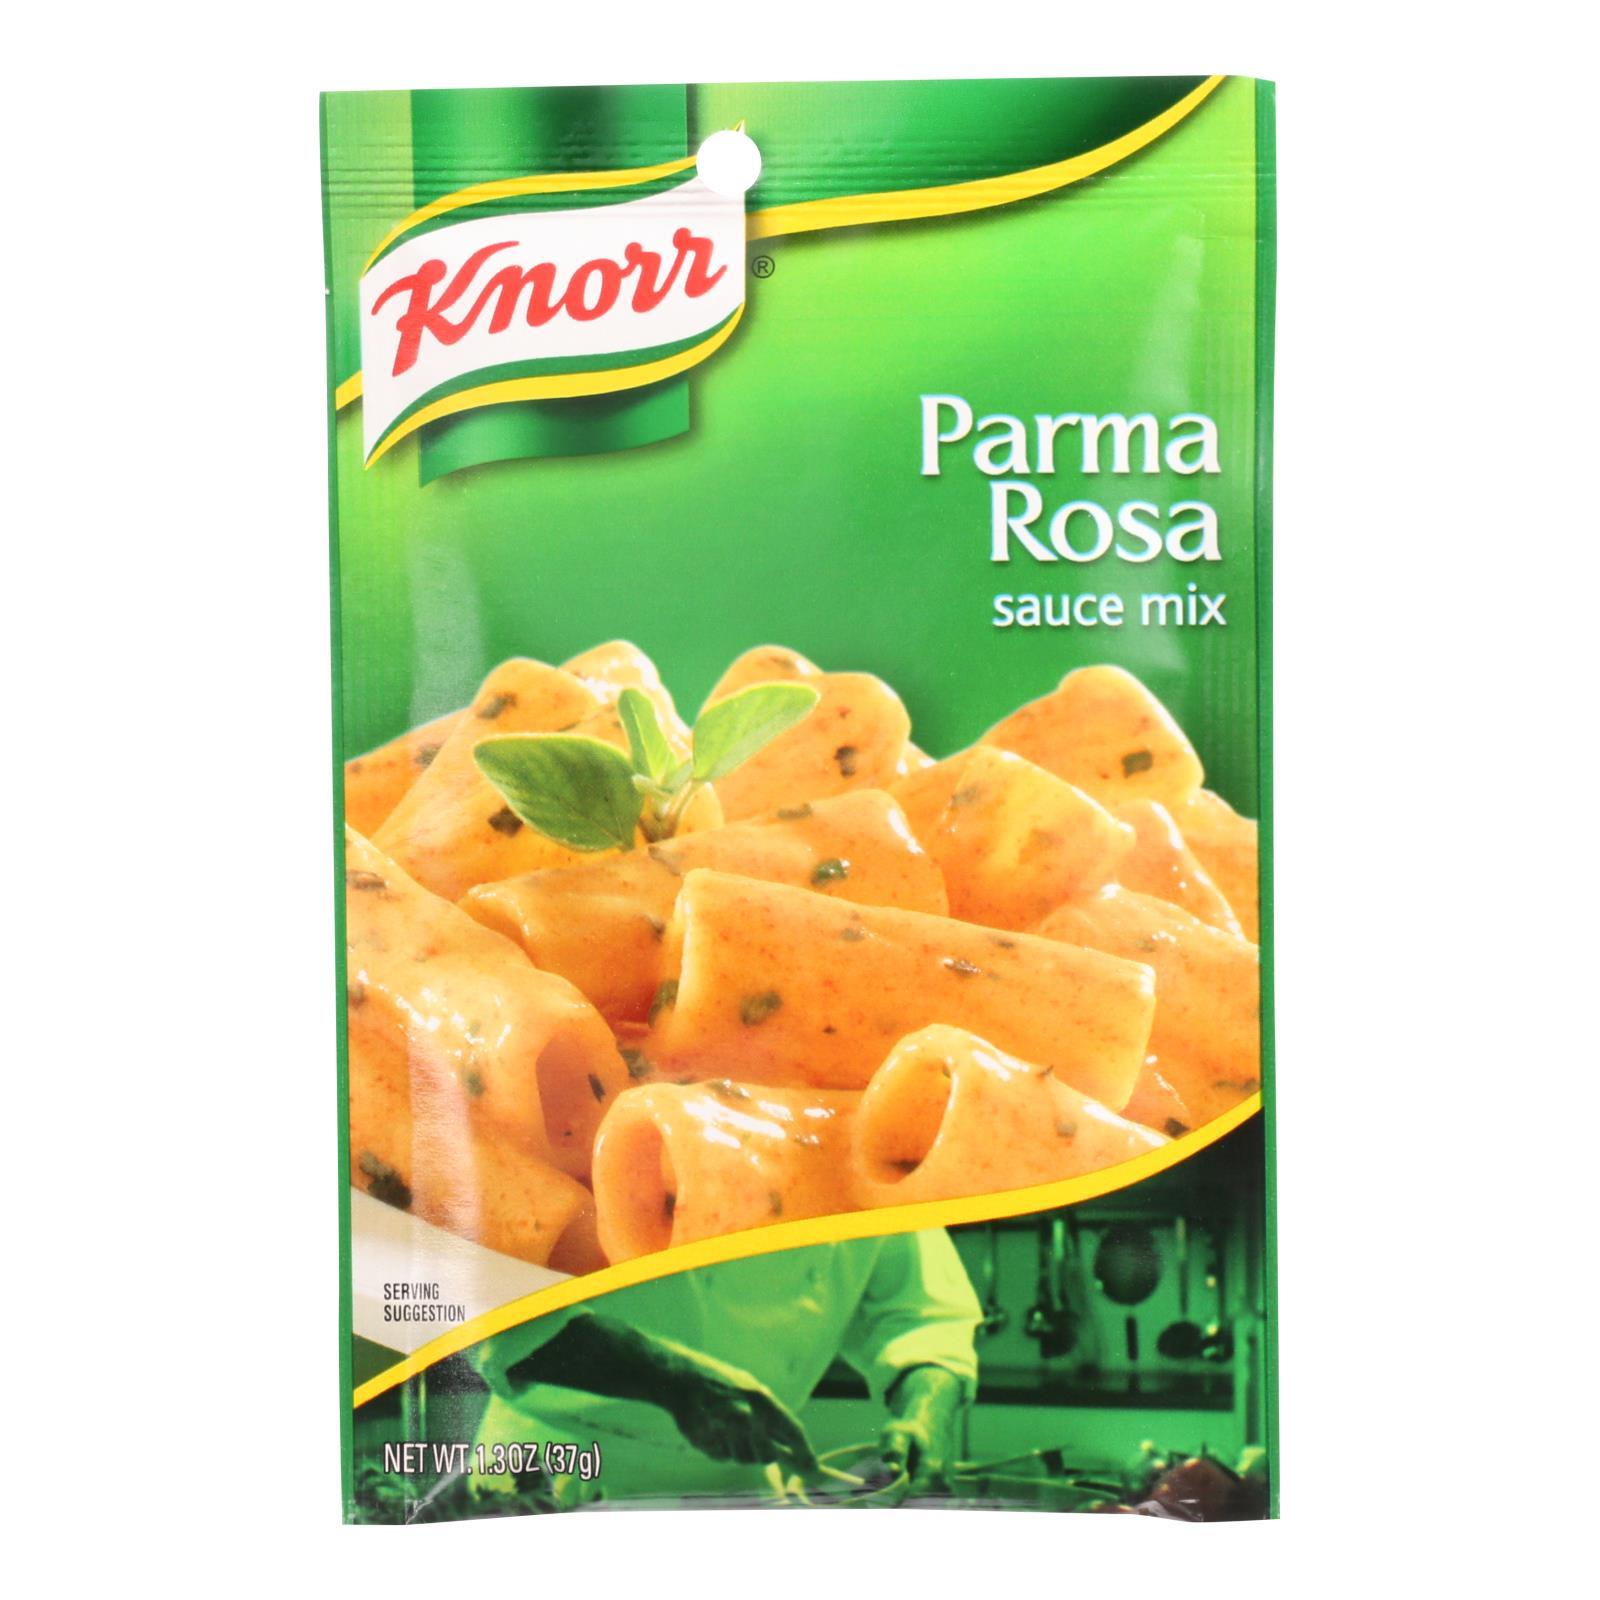 Knorr - Sauce Mix - Parma Rosa - 1.3 Oz - Case Of 12   eBay